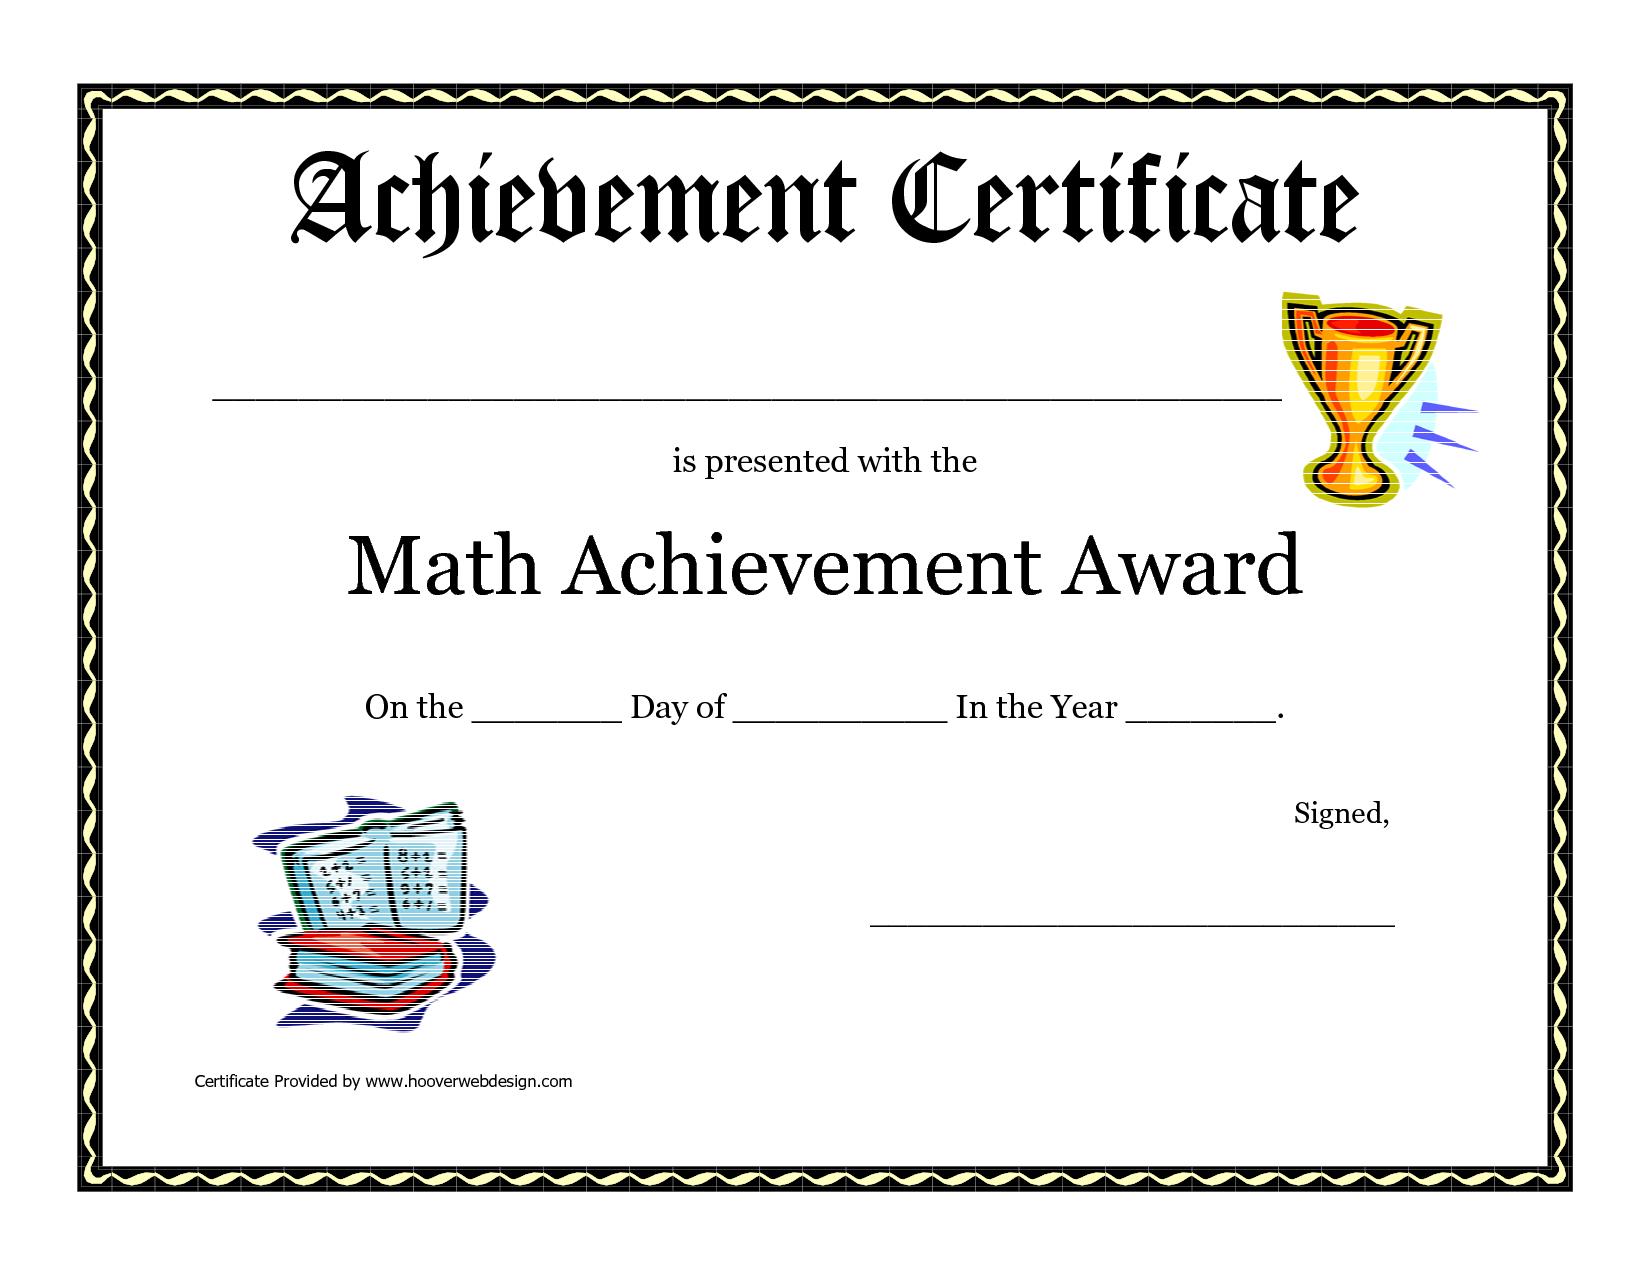 Math Achievement Award Printable Certificate Pdf | Math Activites - Free Printable Student Award Certificate Template